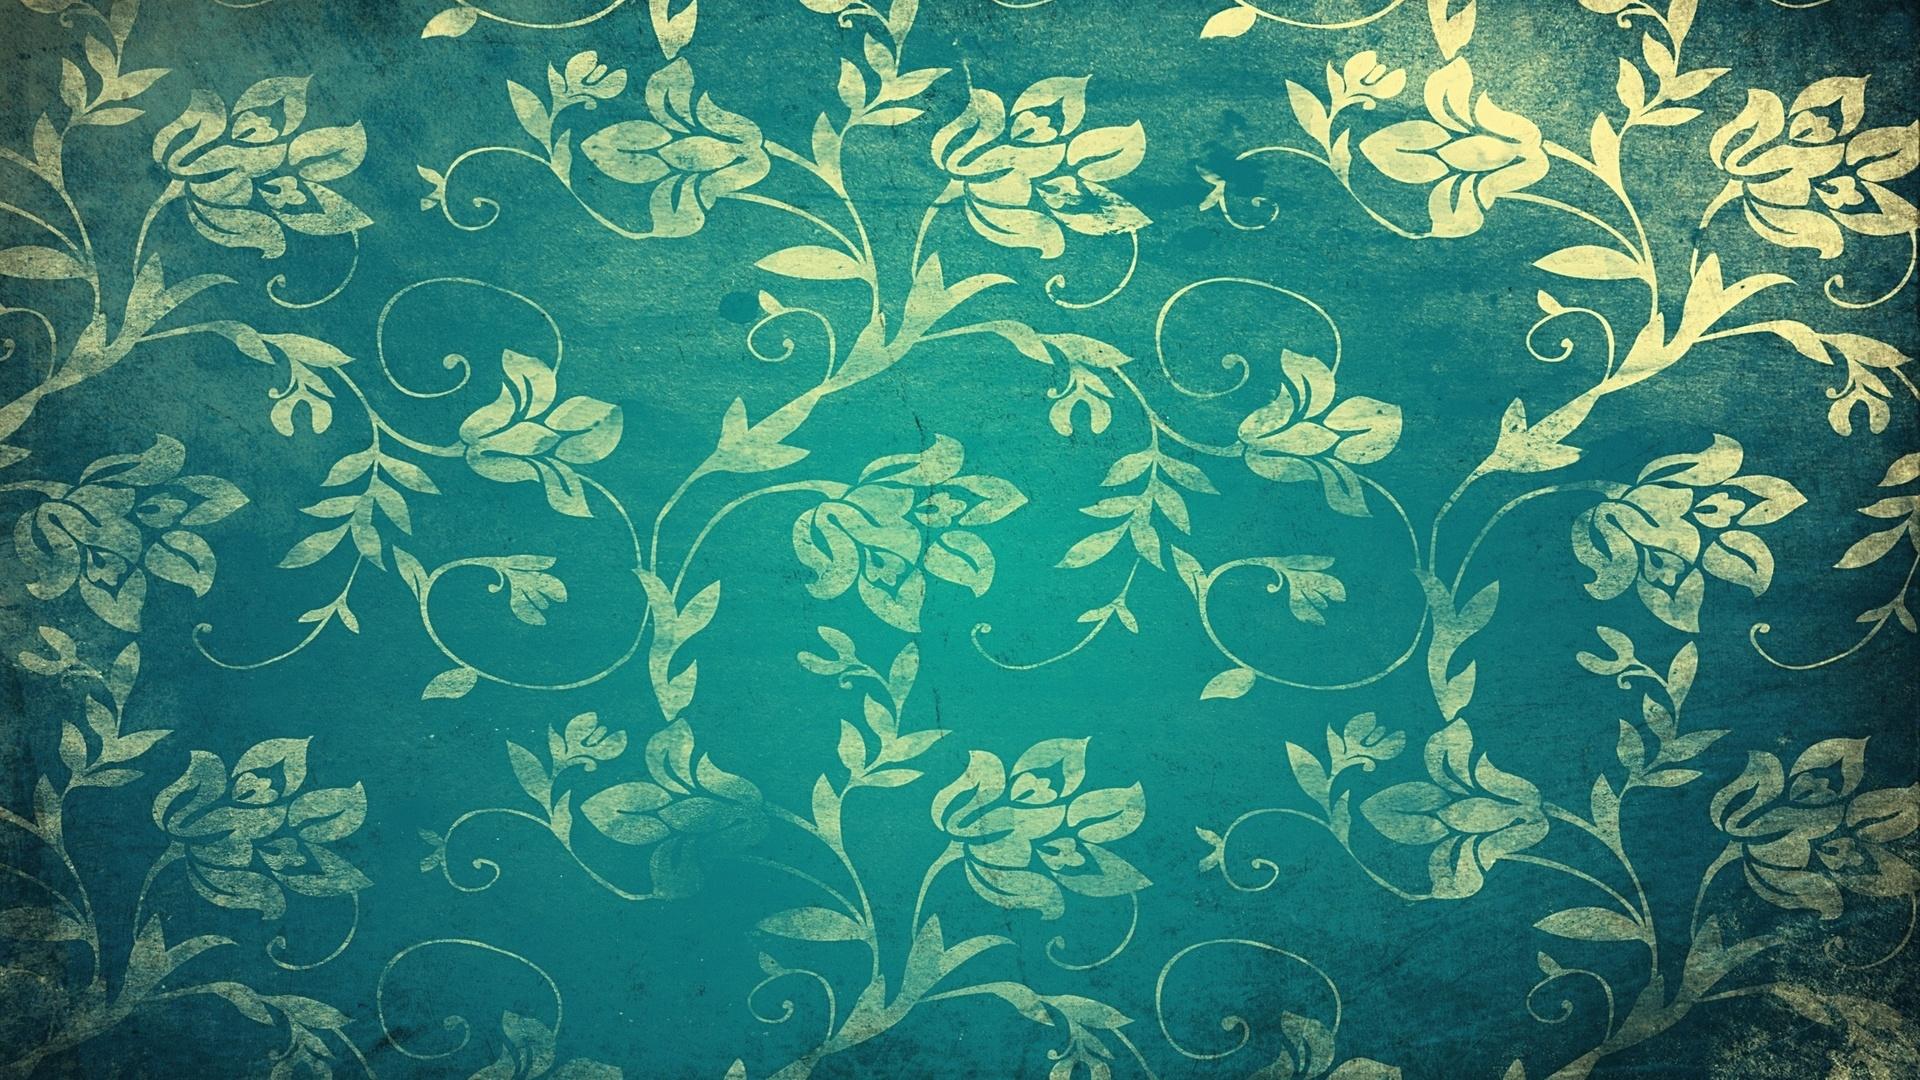 цветы, lines, Текстура, 2560x1600, patterns, flowers, узоры, линий, texture